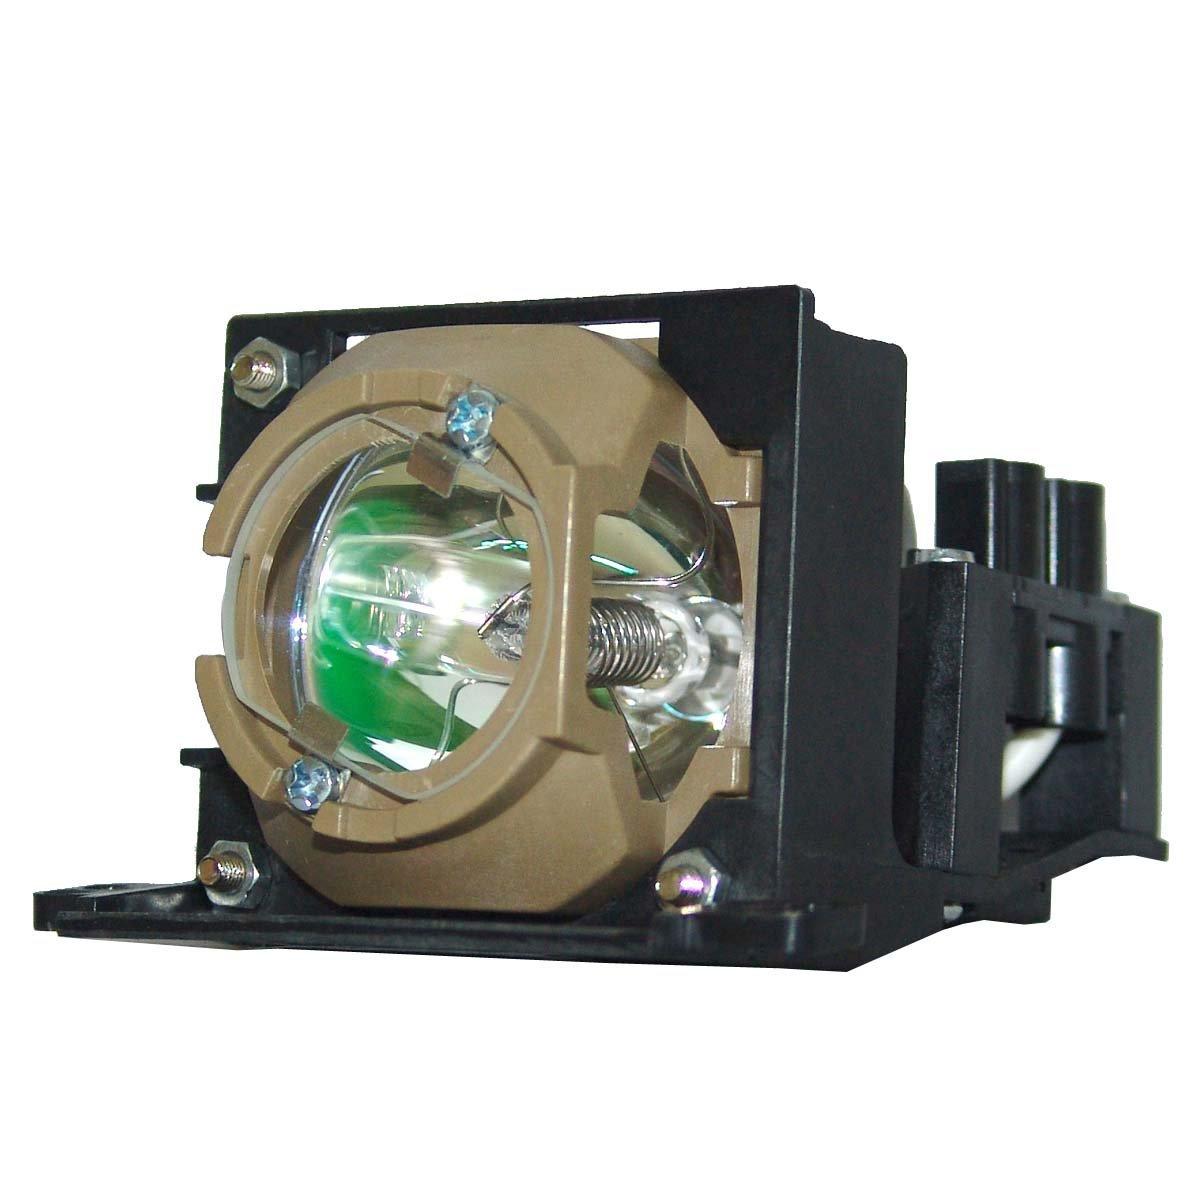 Supermait 310-1705 ランプバルブ DELL 3100MP 交換用ランプ ハウジング付き   B07N3YMLMQ